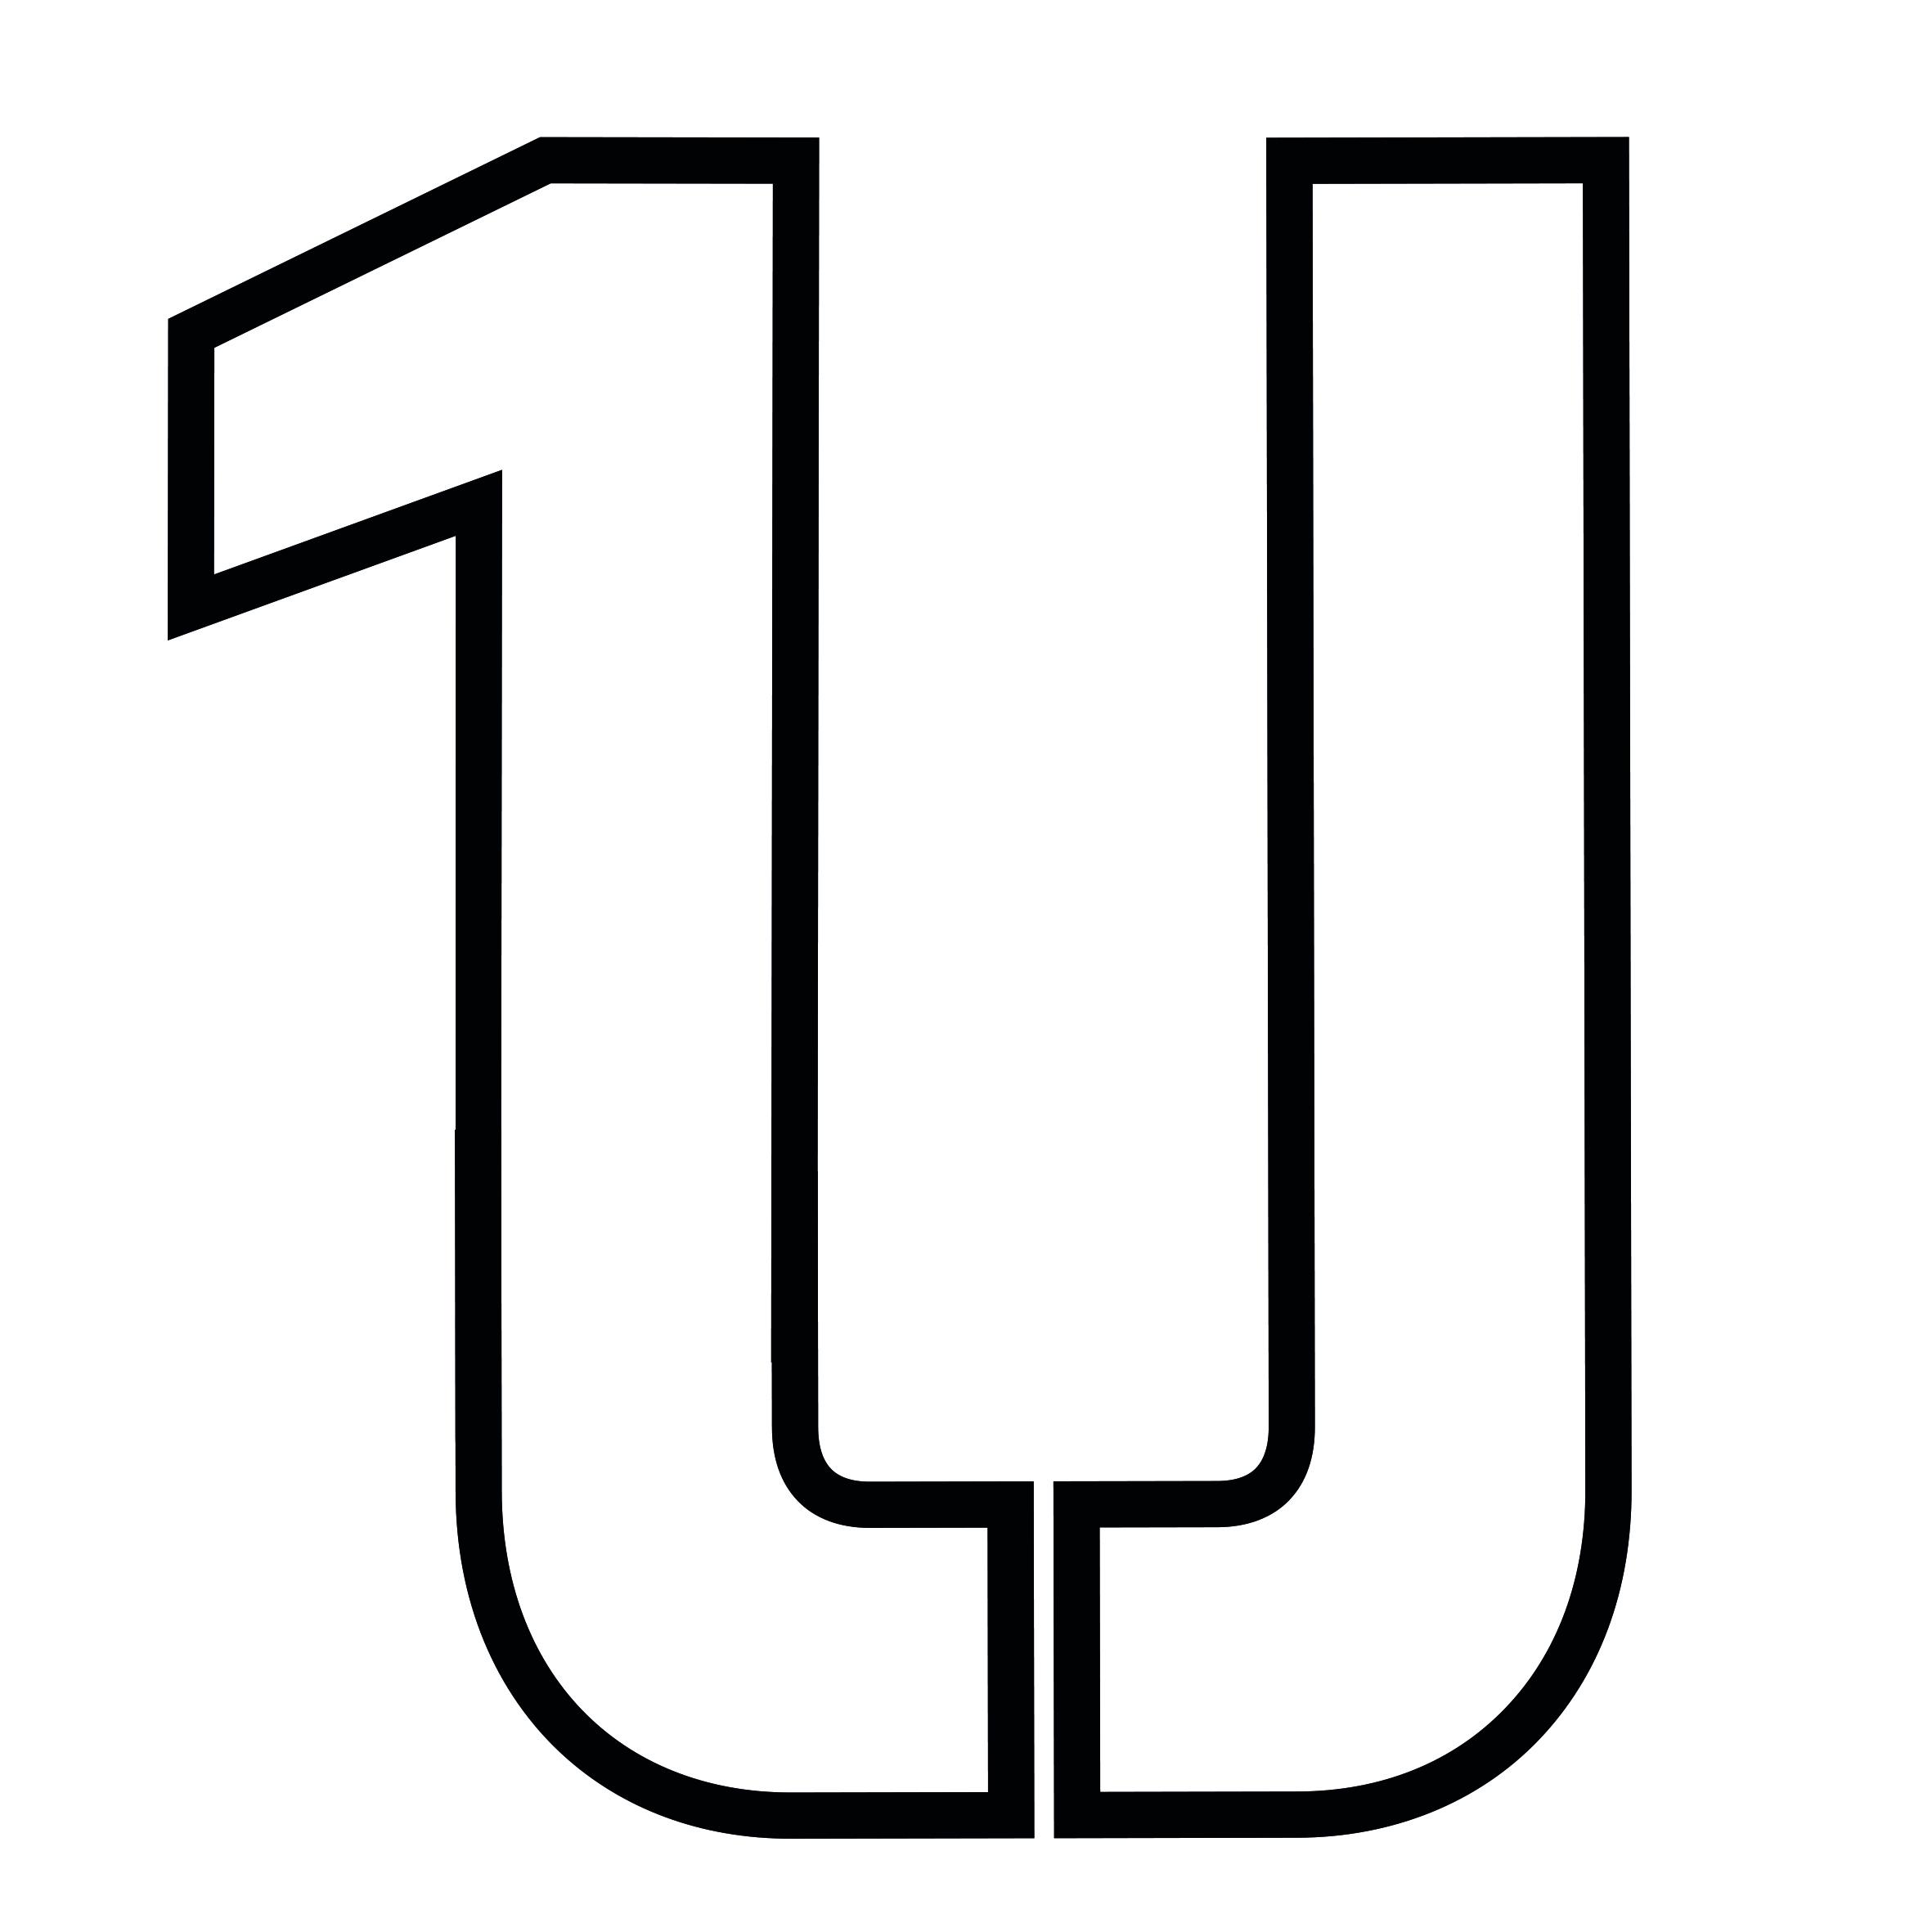 viuleva_referenssi_1urban_logo_favicon